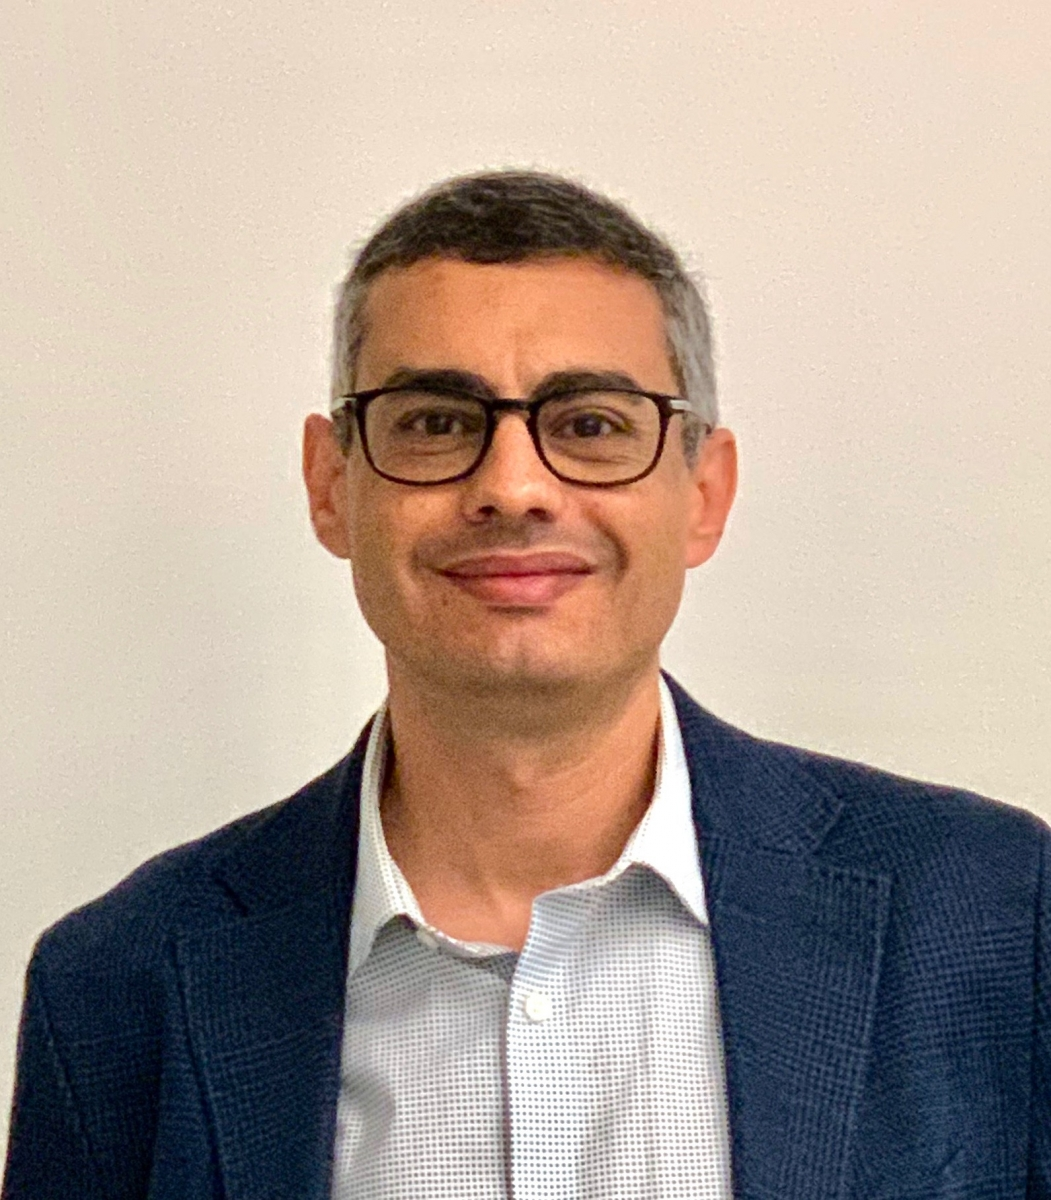 Ayman Nasralla